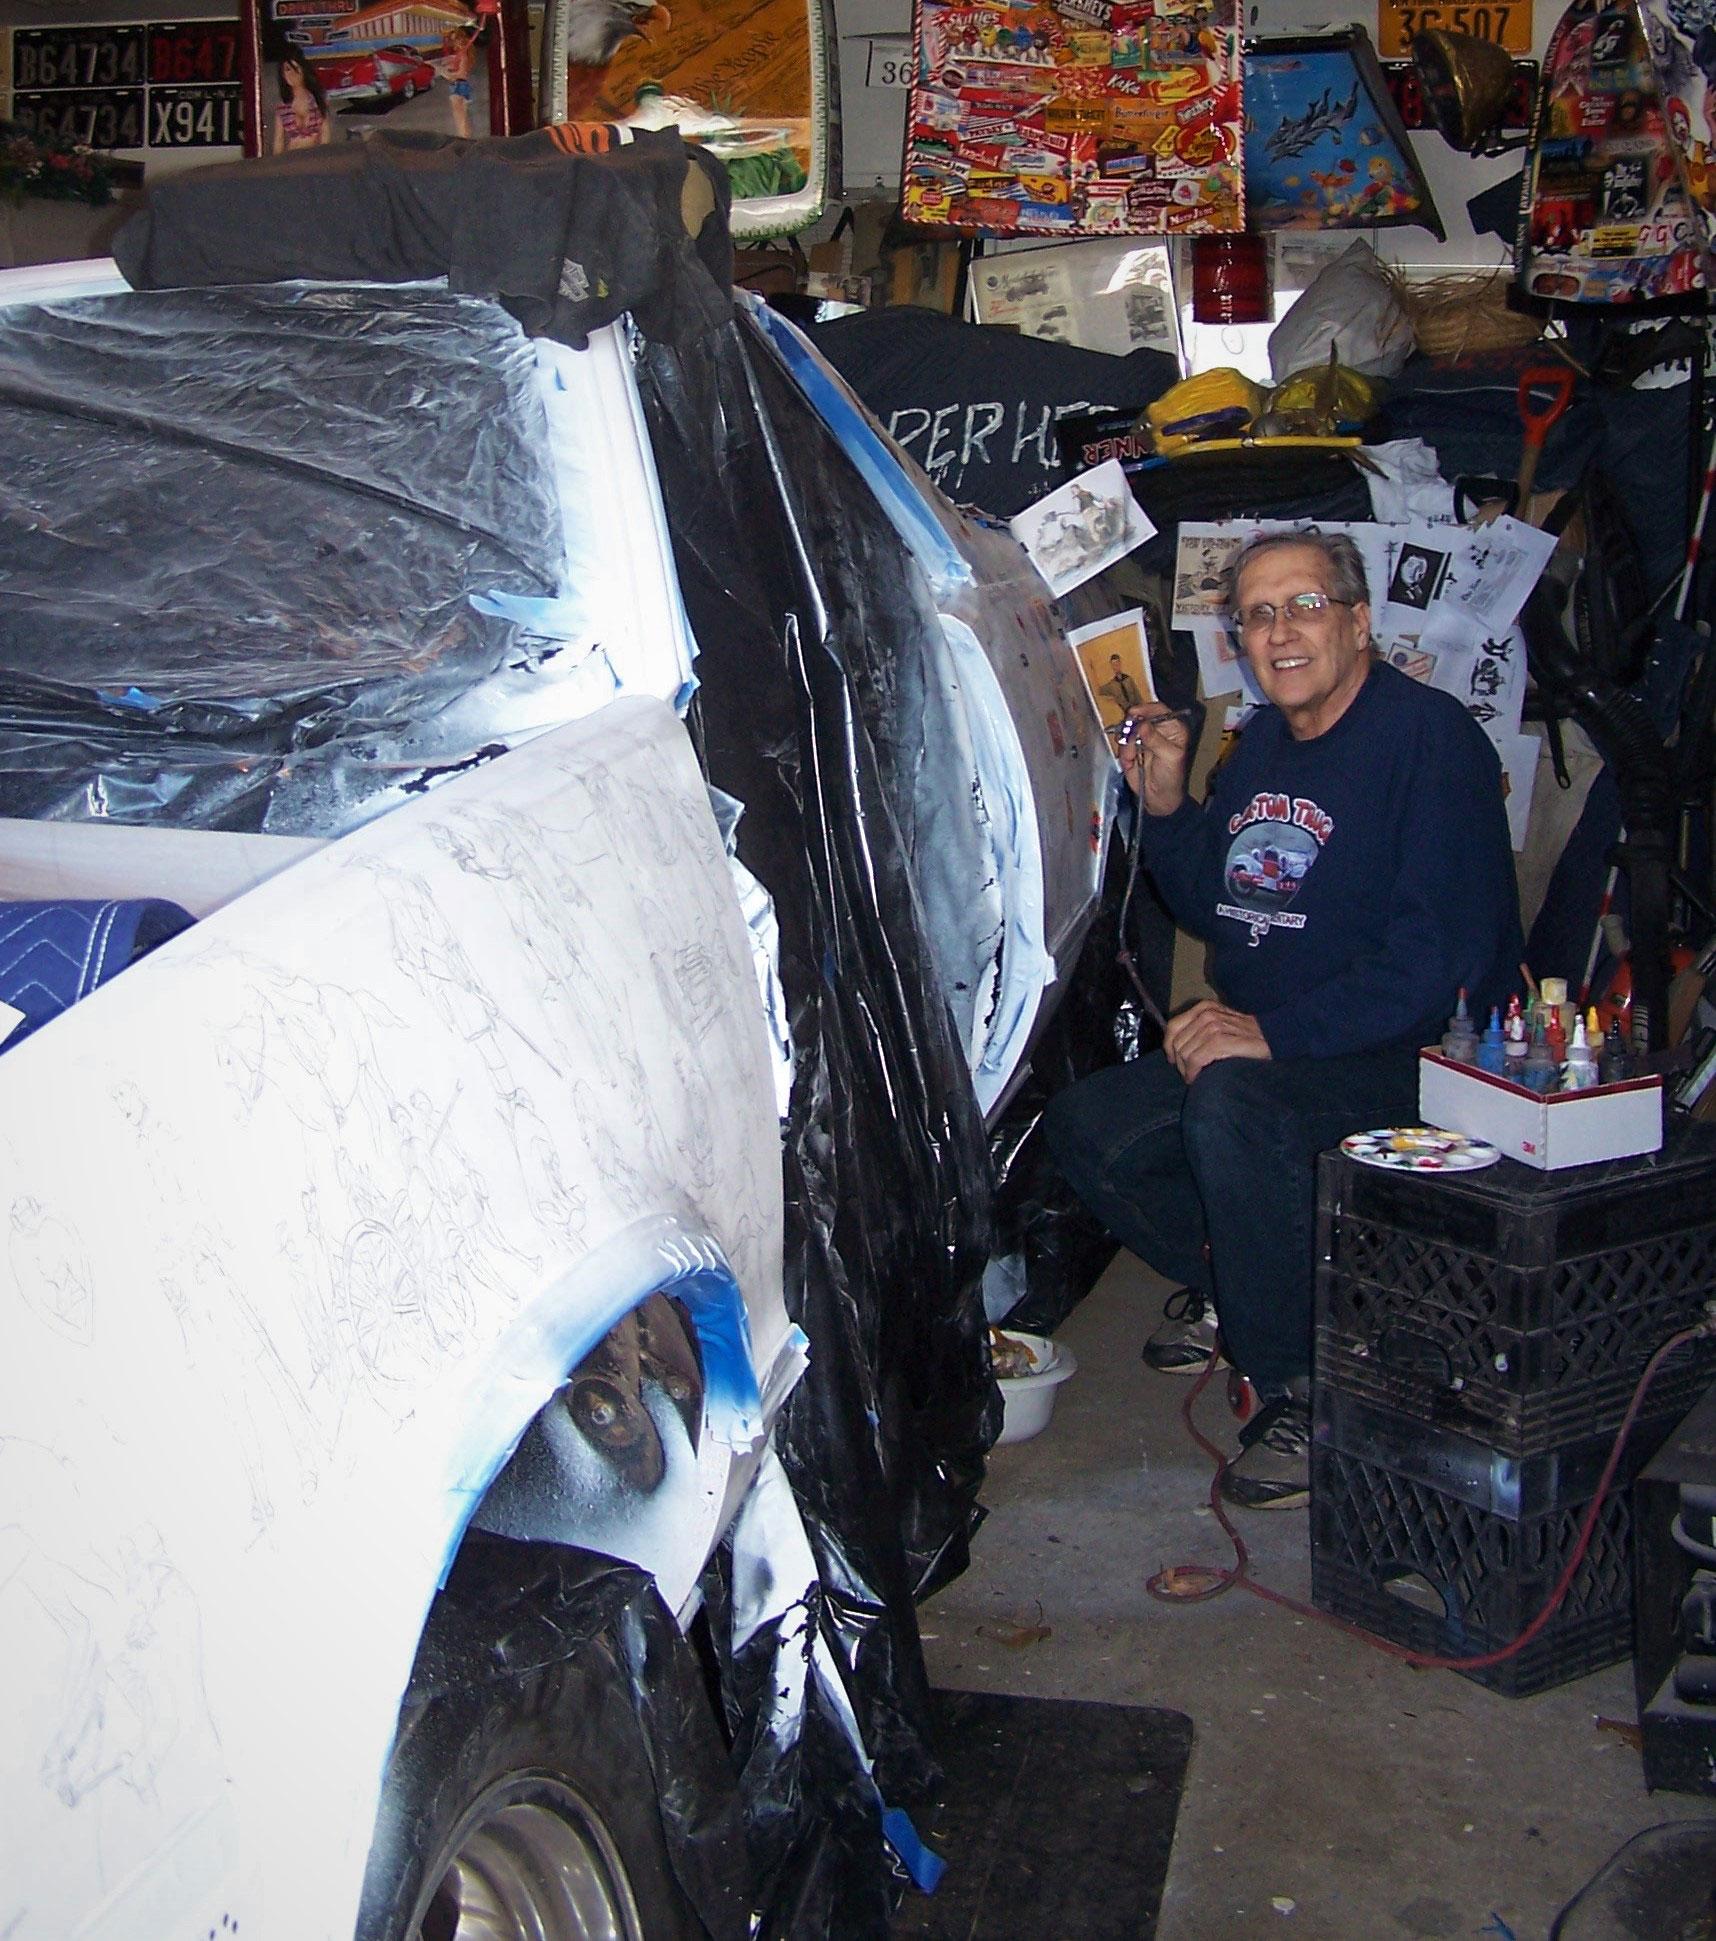 Robert Luczun working on his 1986 Chevrolet El Camino art car project.